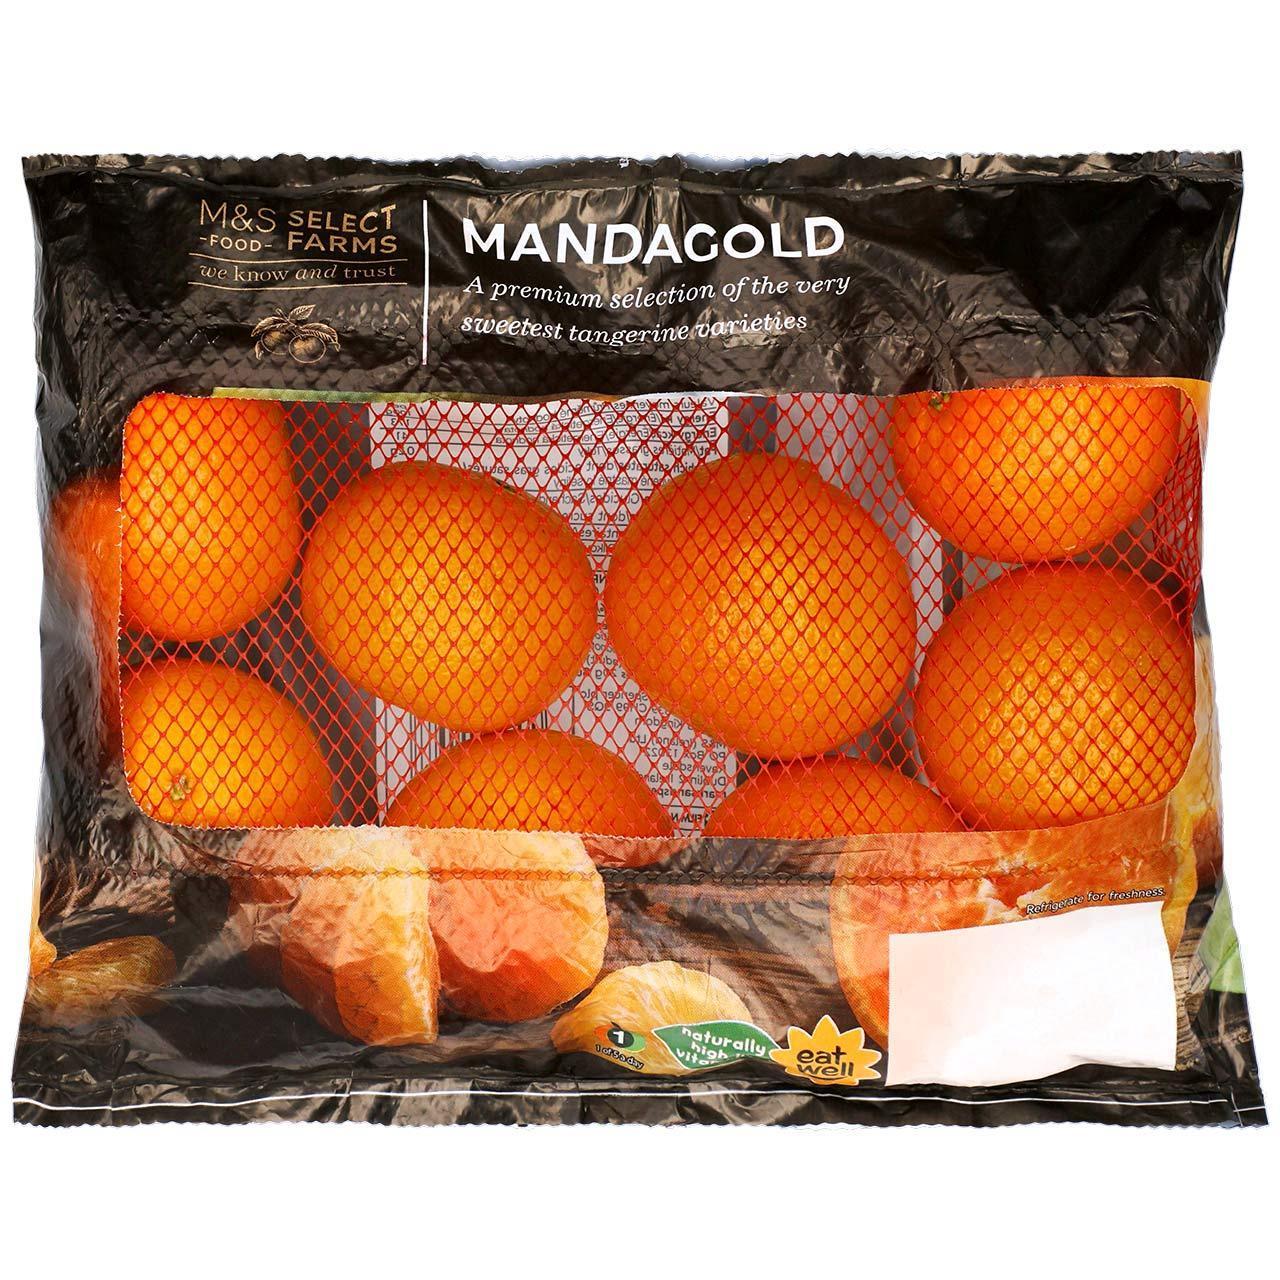 Mandagold Tangerines 600g - 85p / Three Persimmons 45p / Rockit Apples (Min 4 Pack) £1 / Avocado 65p @ Marks & Spencer instore